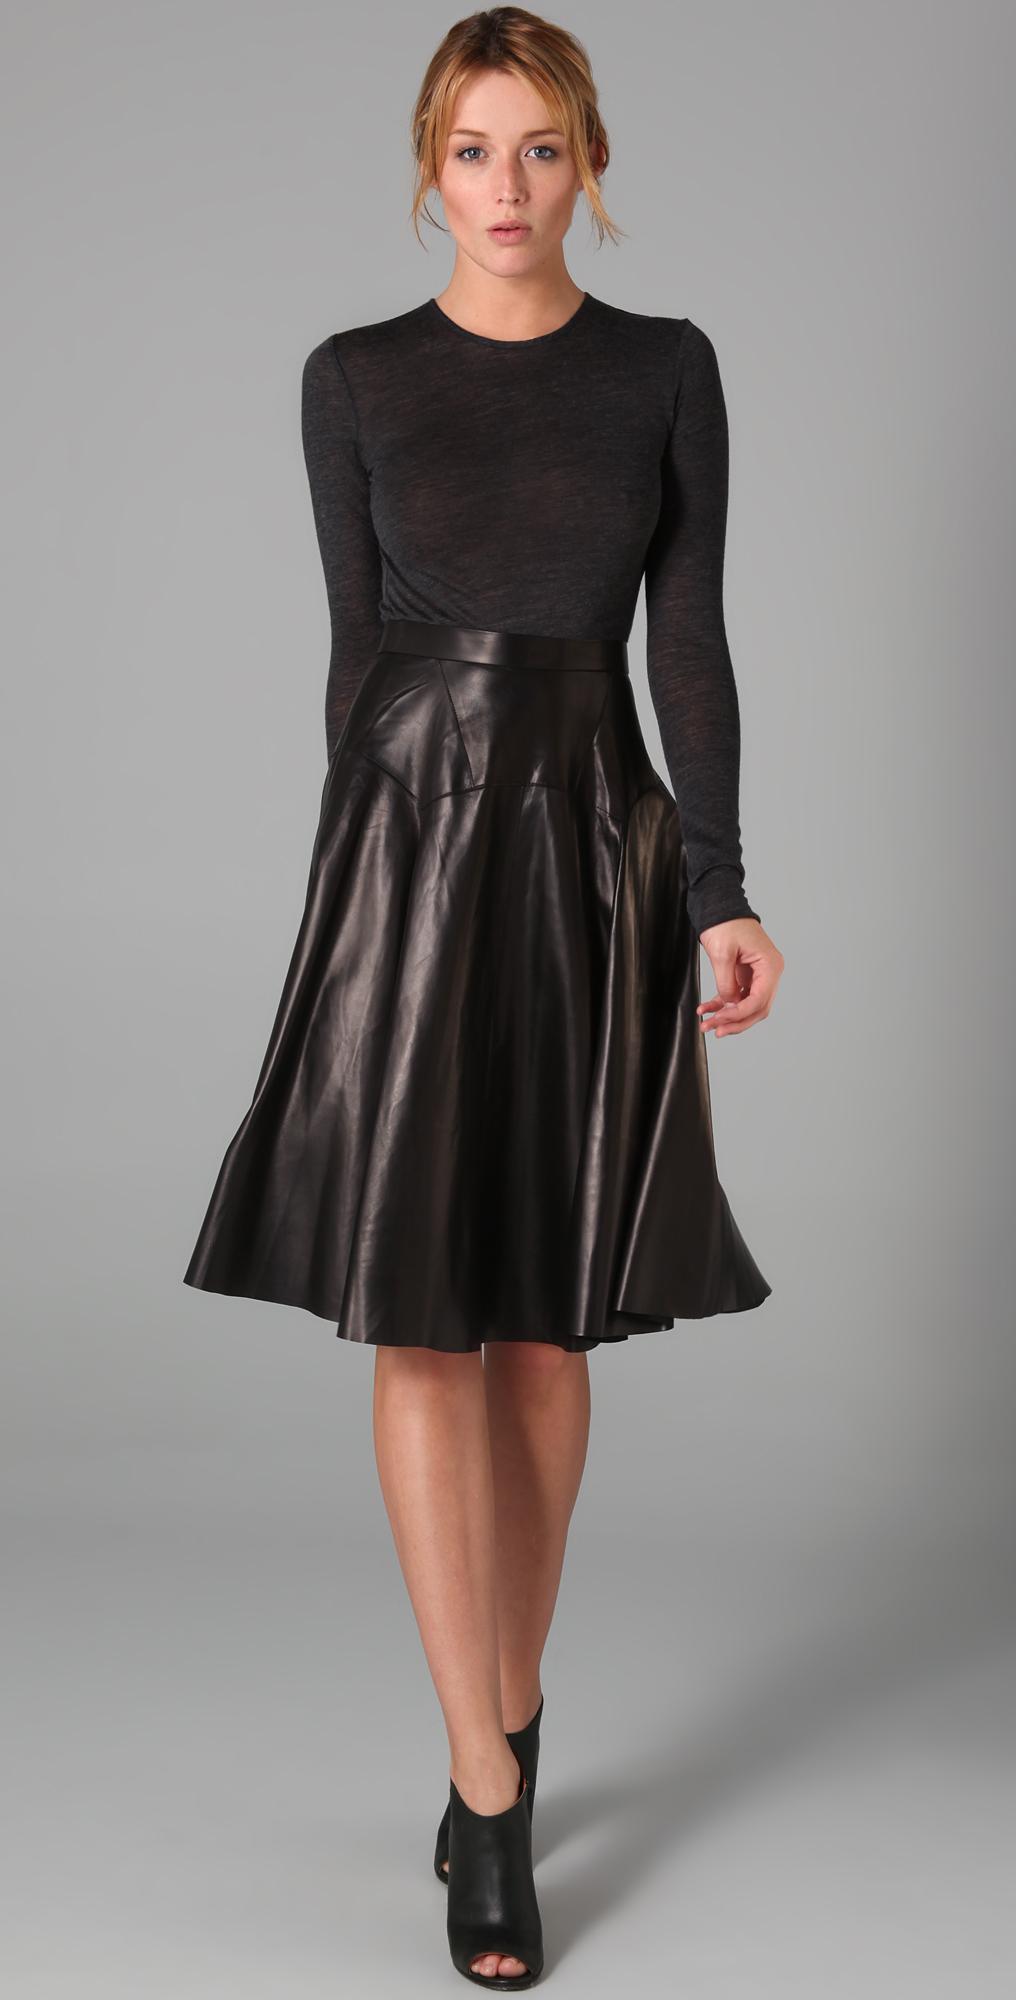 Derek Lam Long Sleeve Leather Dress with Jersey Bodice - SHOPBOP